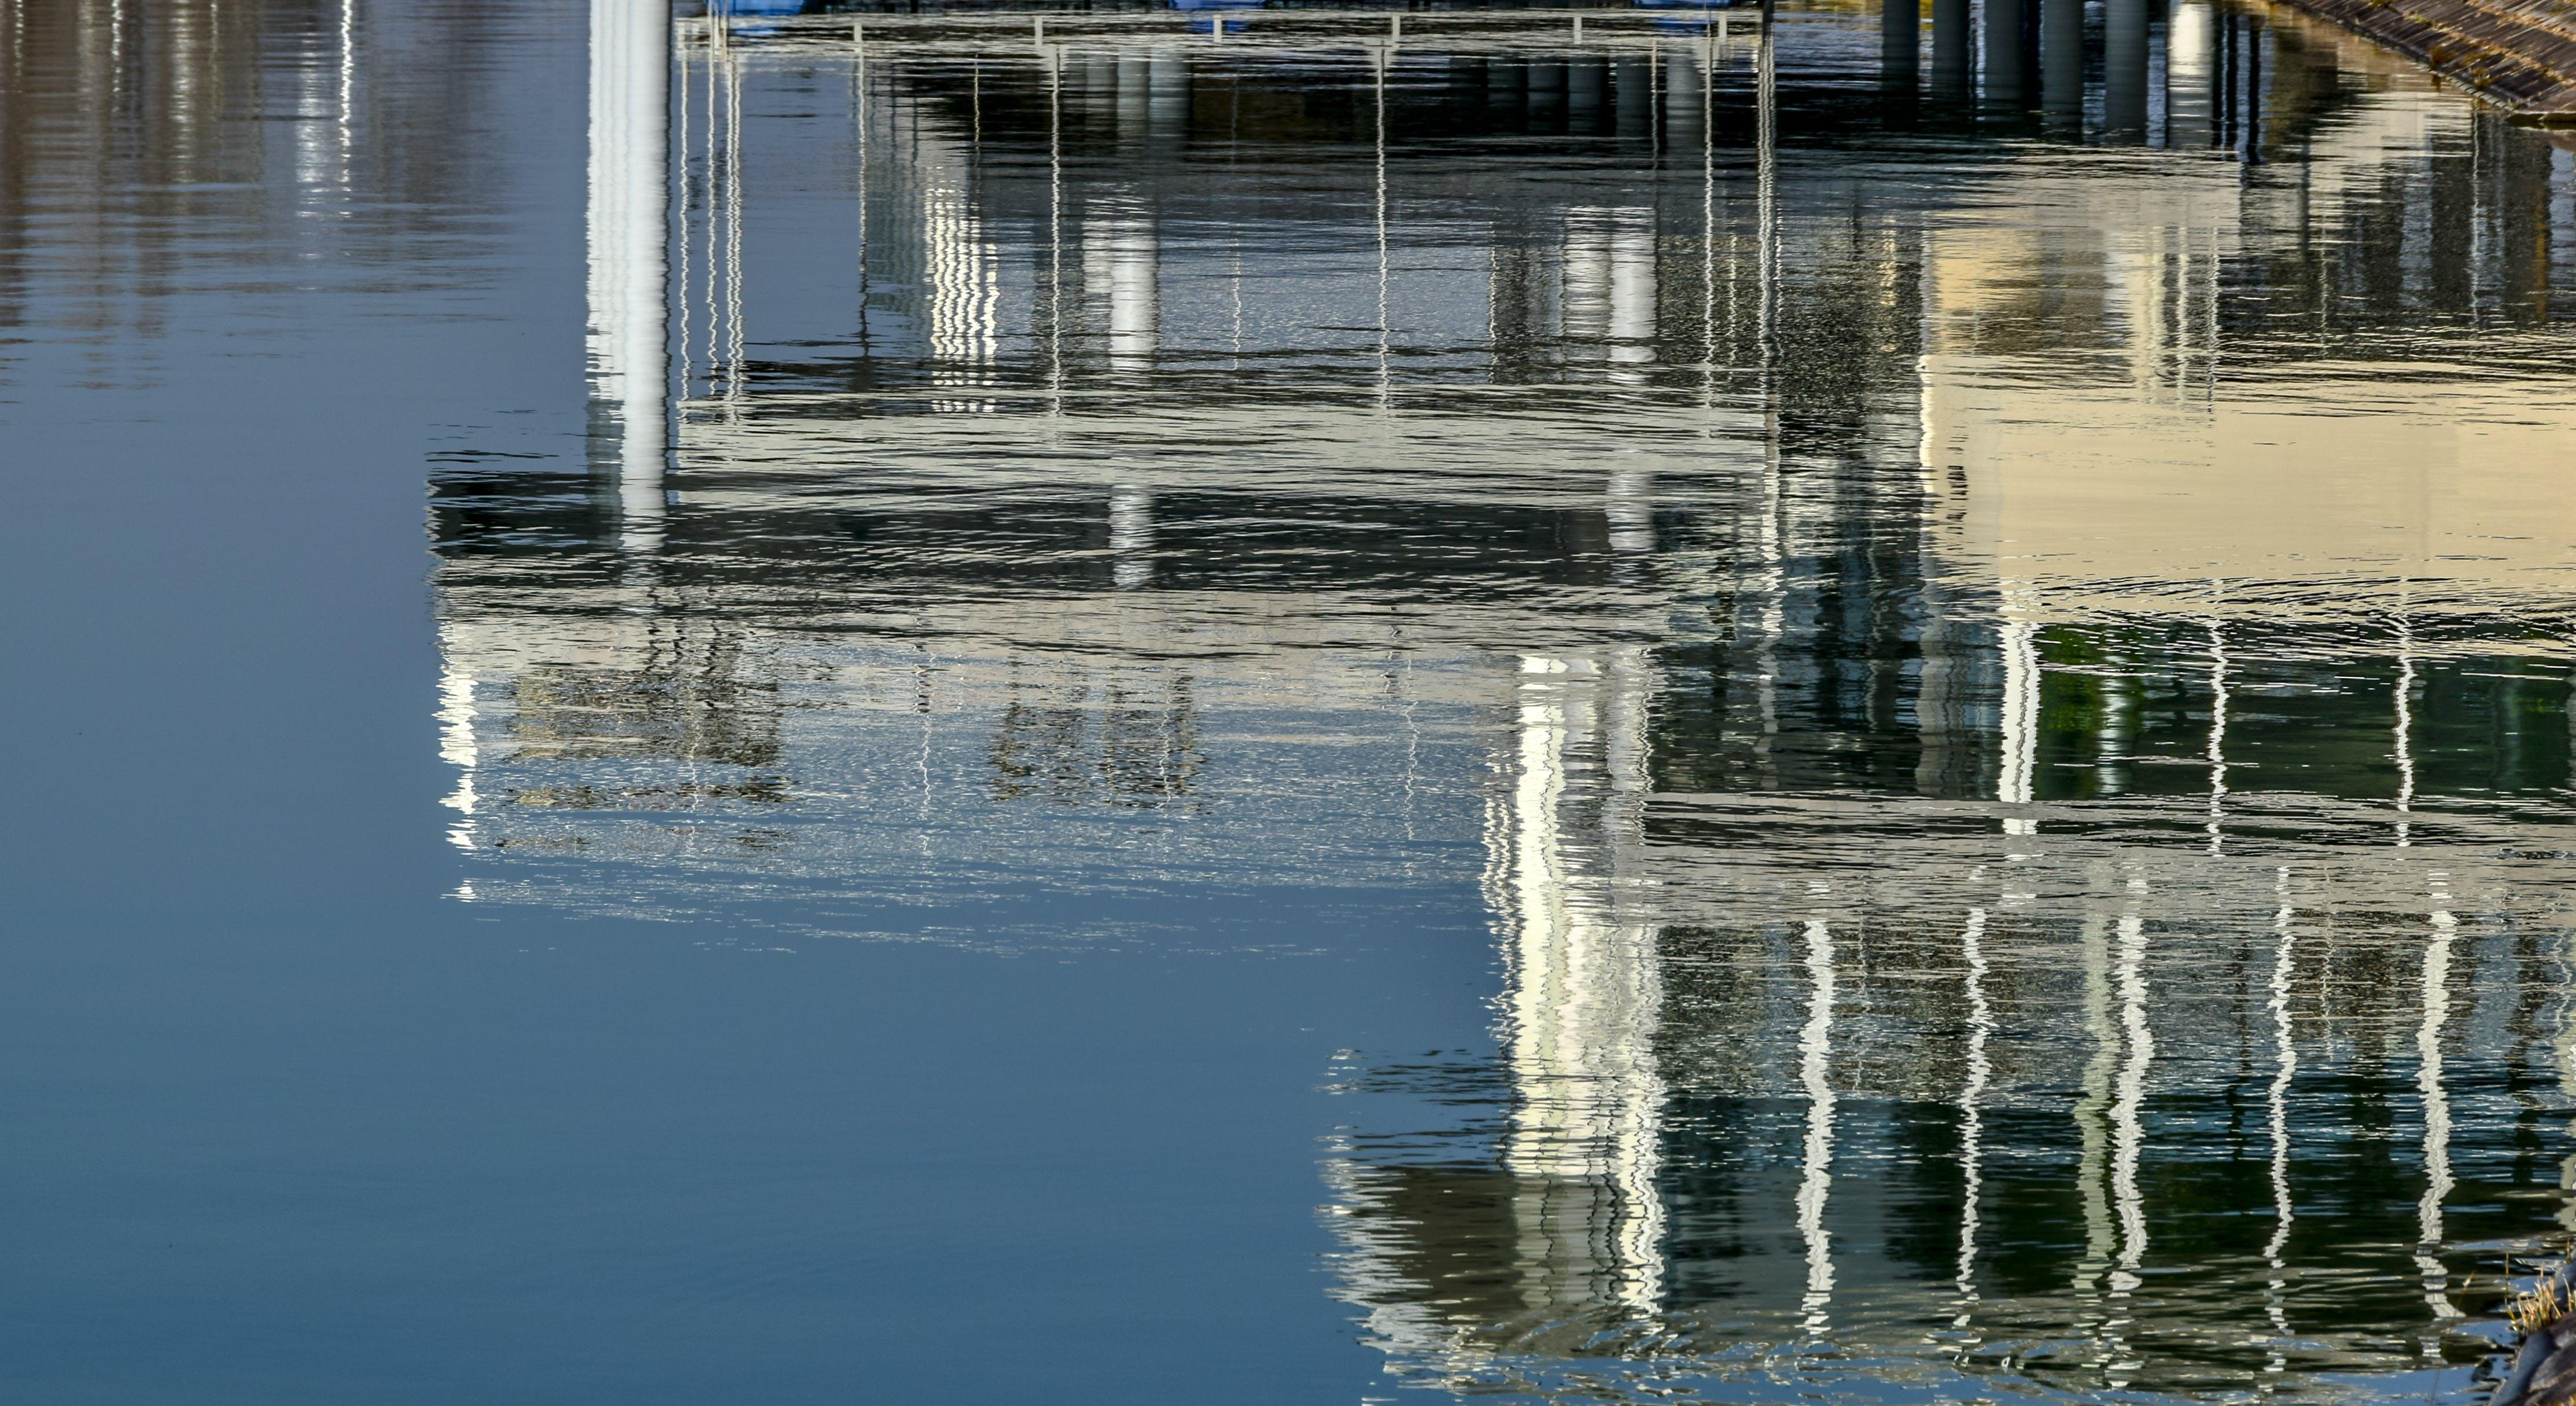 Free stock photo of water, lake, reflection, mirror